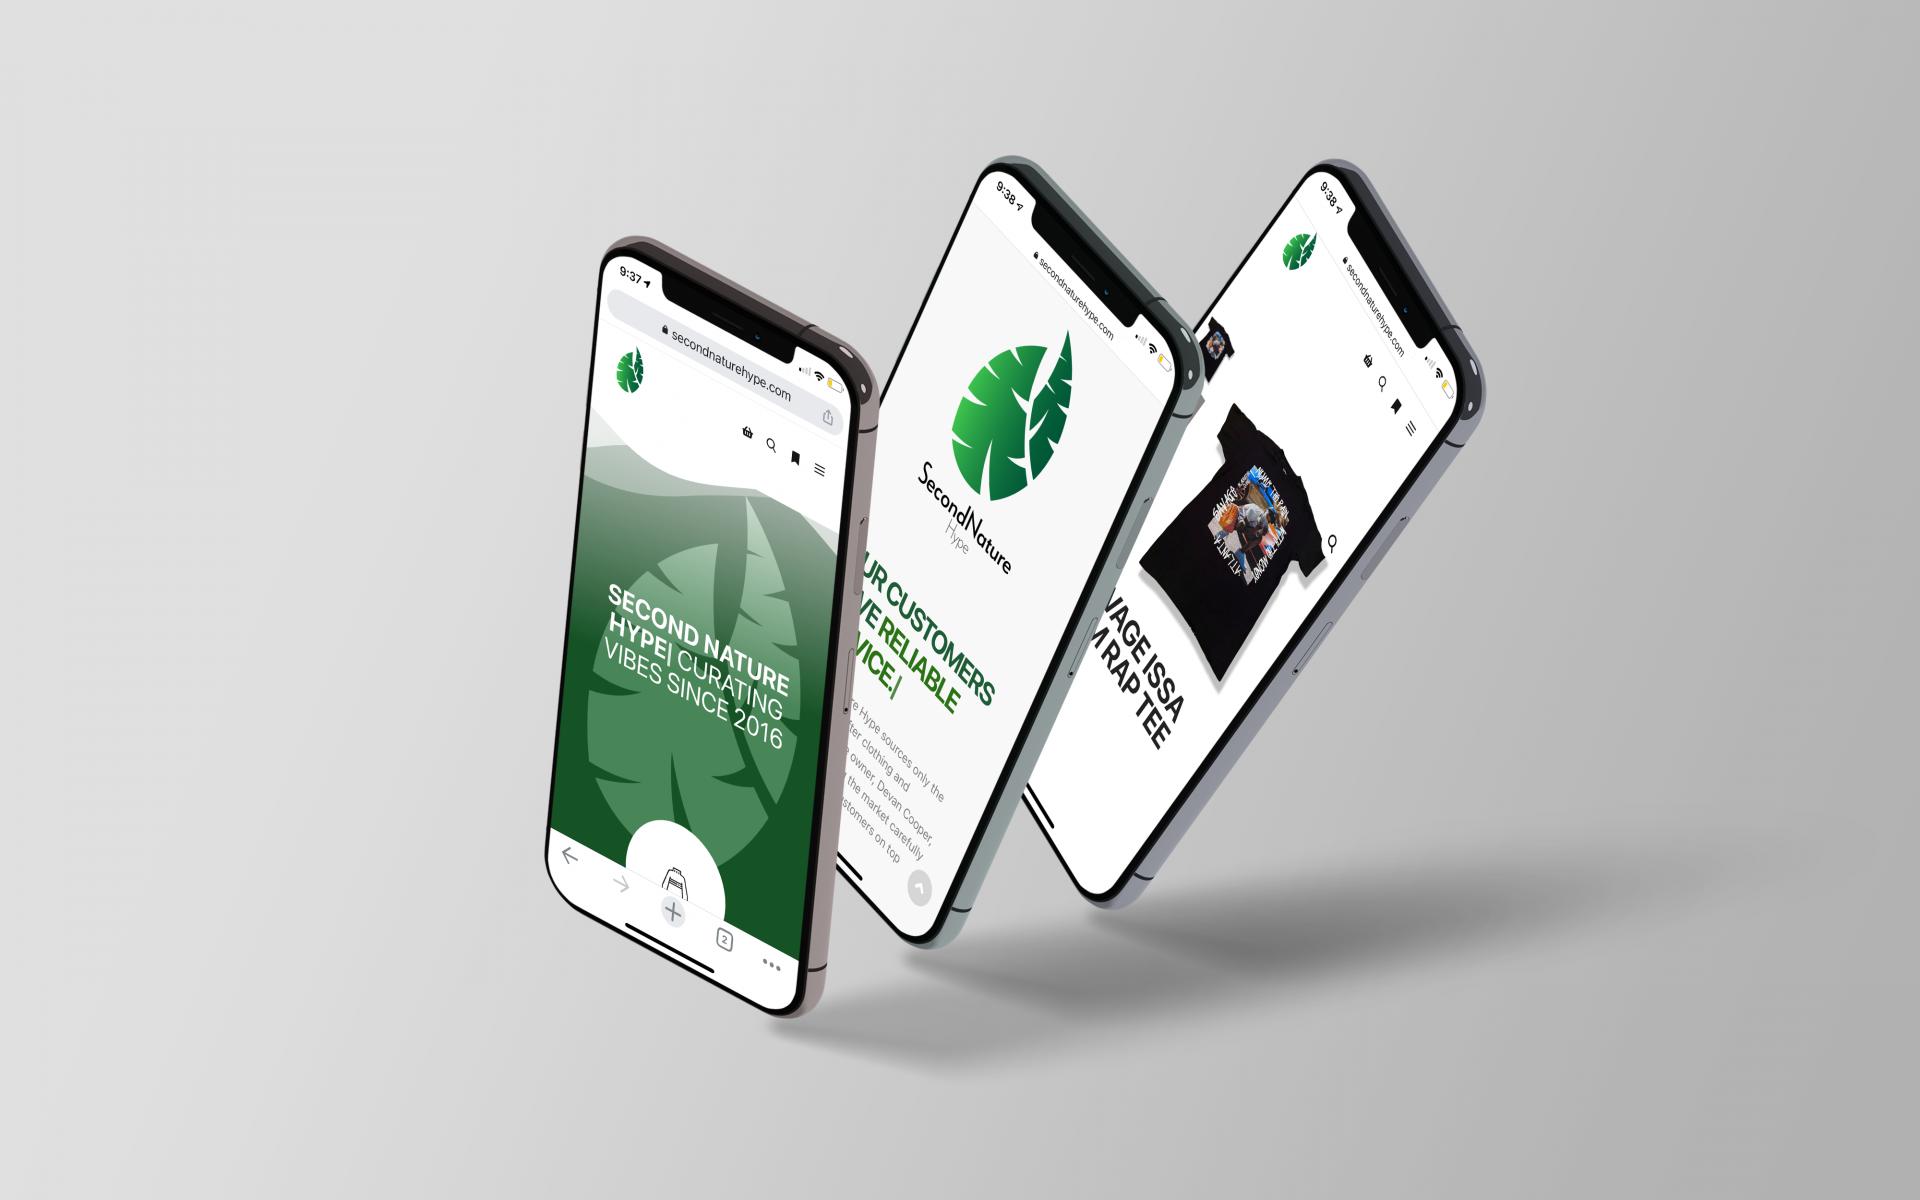 Second Nature Hype Website Design